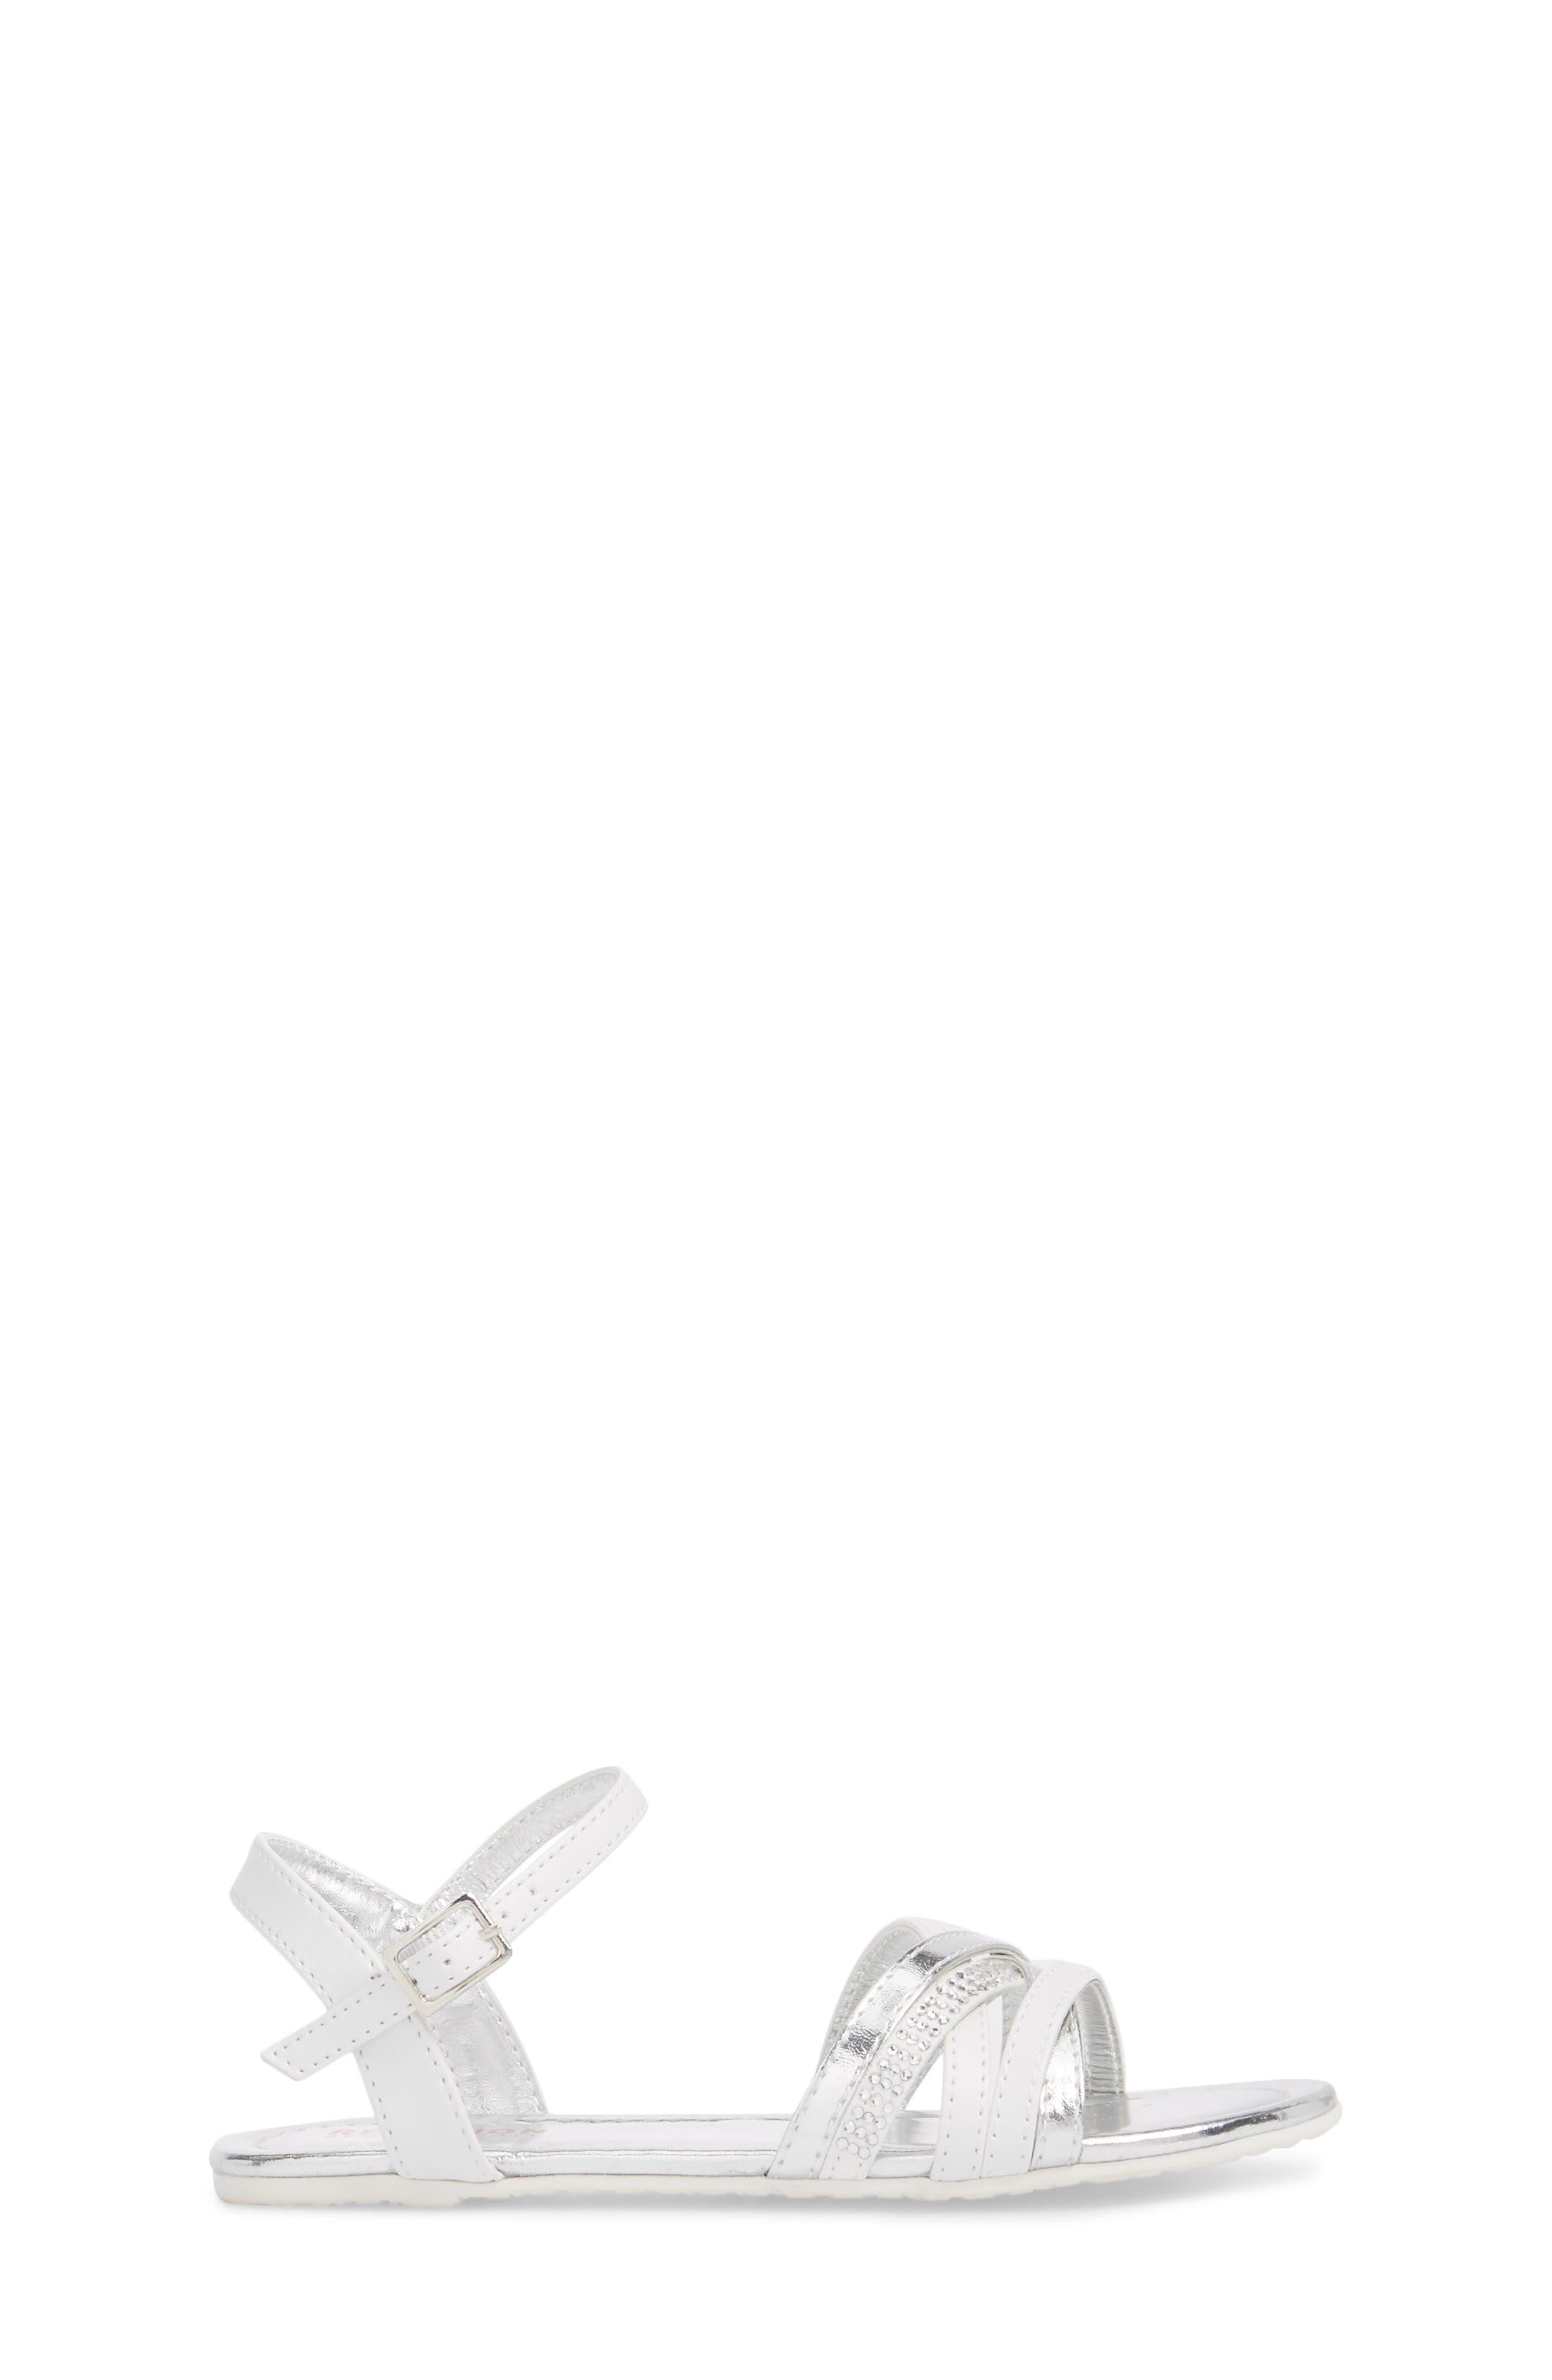 Kiera Getty Crystal Sandal,                             Alternate thumbnail 3, color,                             100